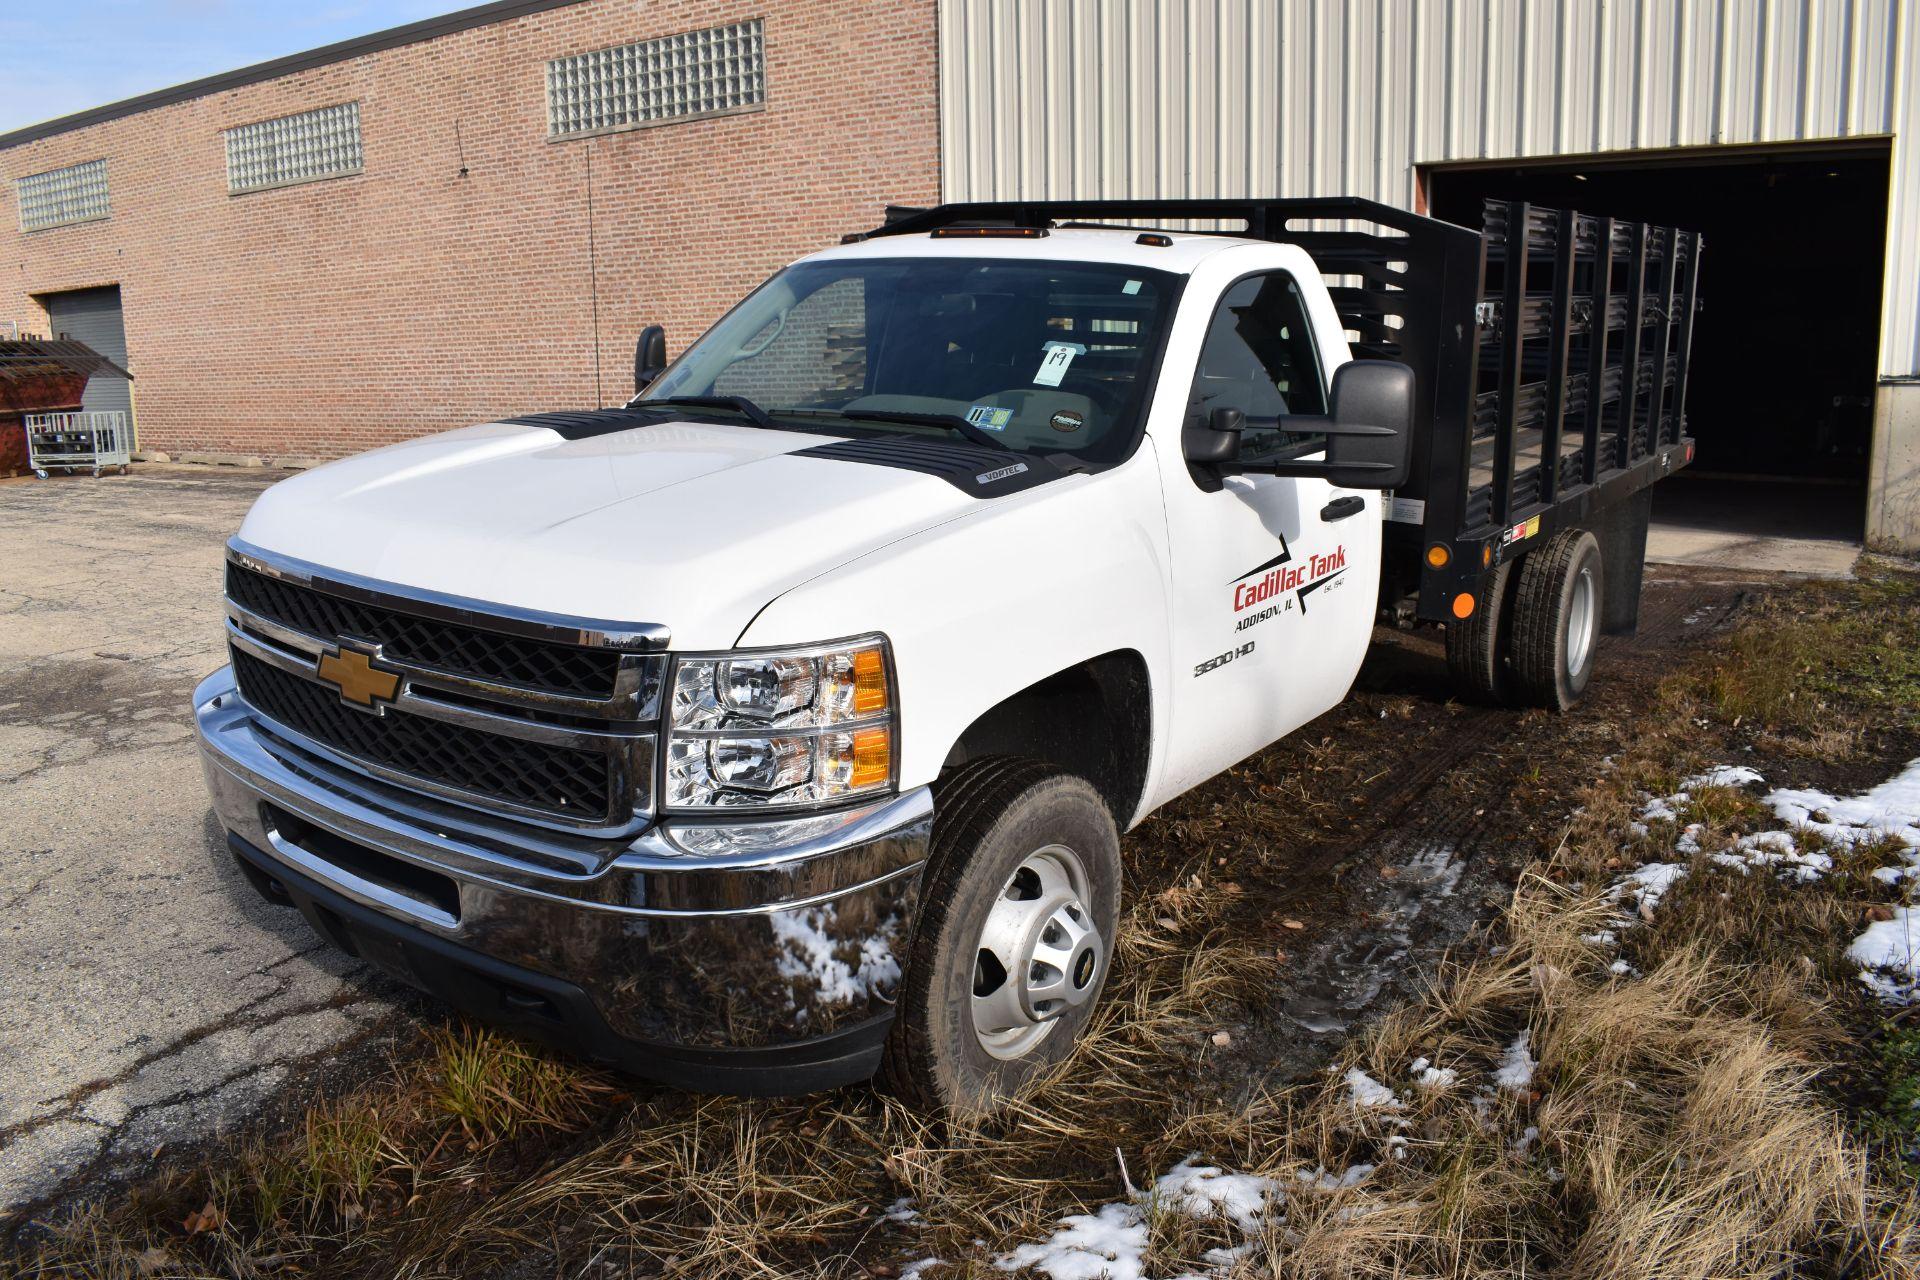 Lot 19 - 2012 Chevrolet Model 3500 HD Single-Axle Gas Stake Bed Truck, VIN 1GB3CZCG3CF166651, 16,252 miles,